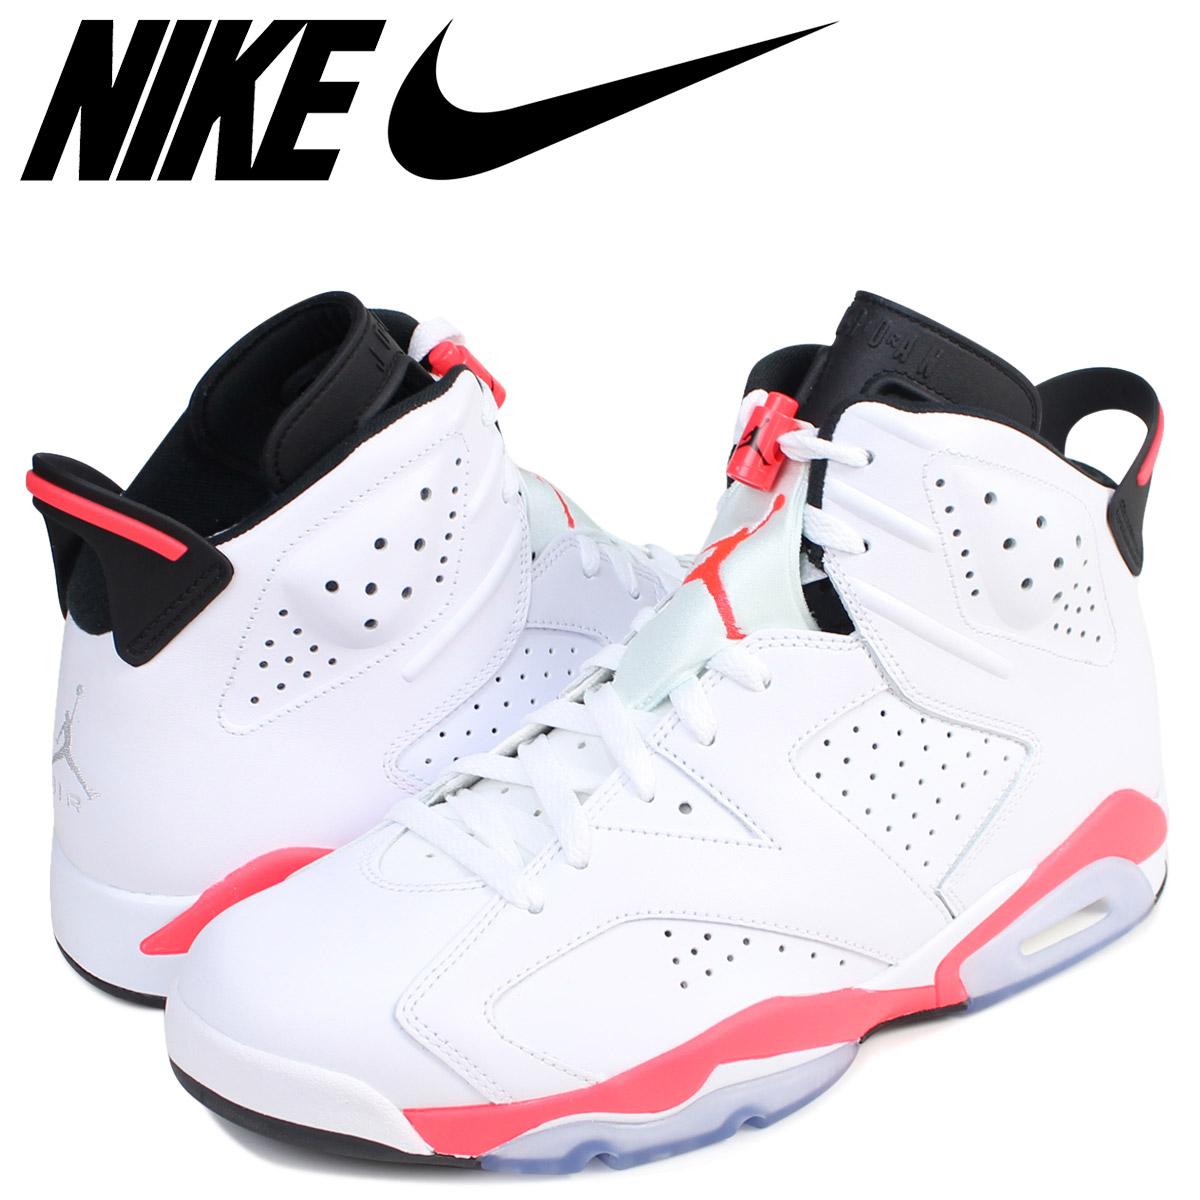 reputable site ef654 07190 NIKE Nike Air Jordan 6 nostalgic sneakers AIR JORDAN 6 RETRO INFRARED men  384,664-123 shoes white white